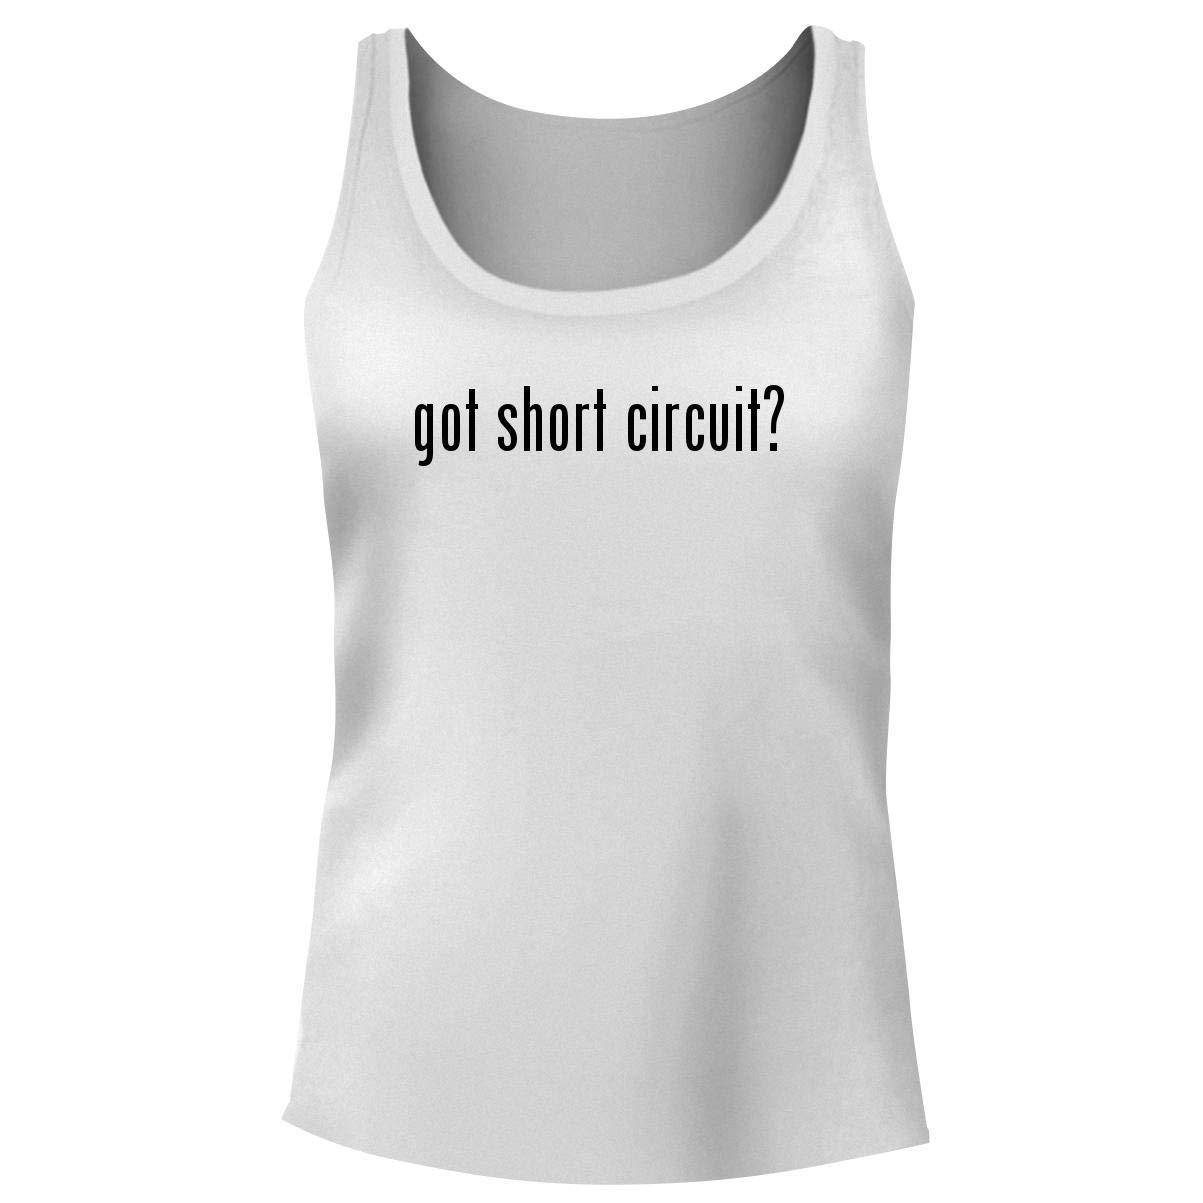 4b848dddb8f79 Amazon.com  One Legging it Around got Short Circuit  - Women s Funny Soft  Tank Top  Clothing